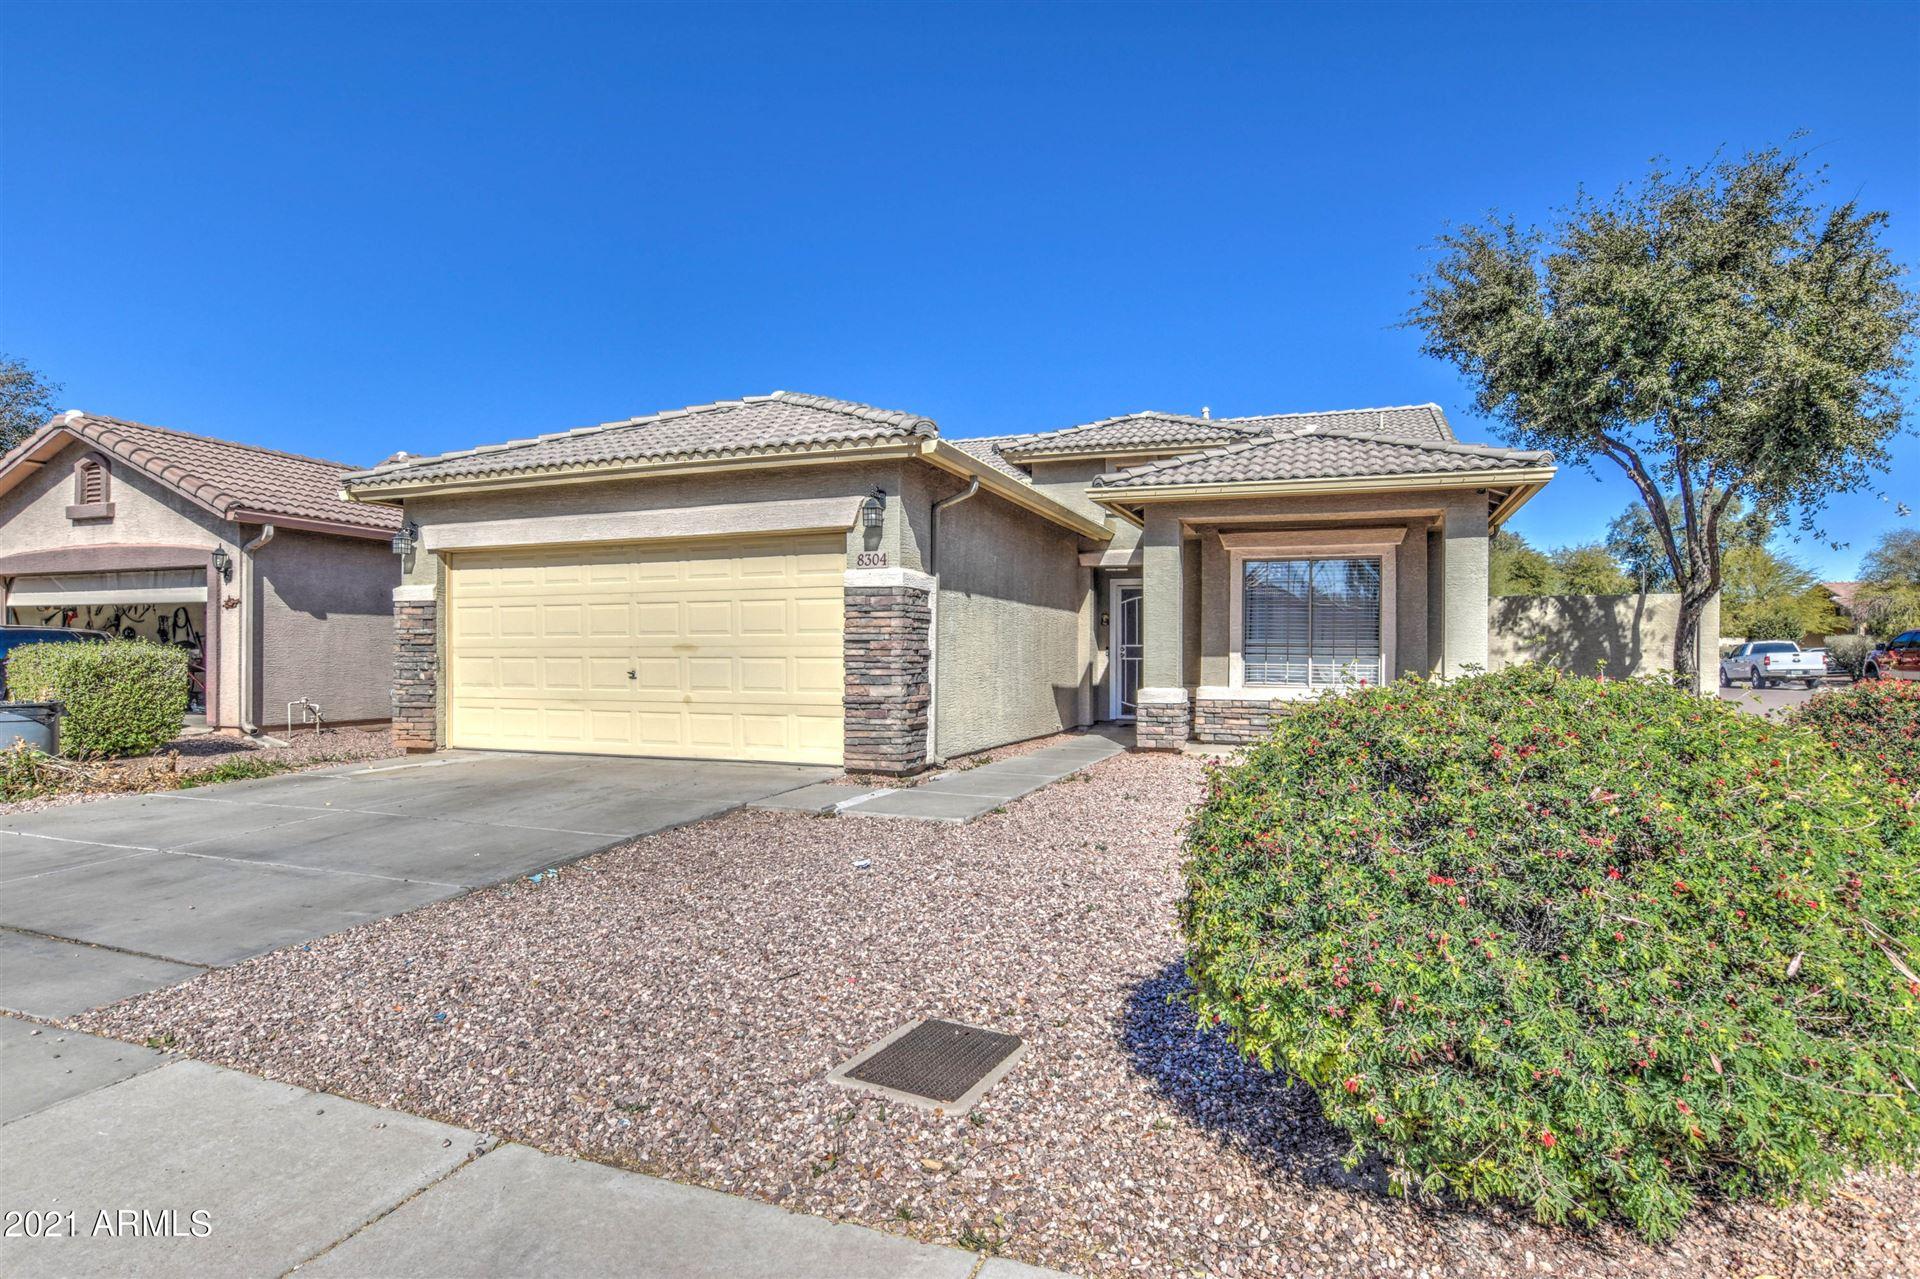 Photo of 8304 W PIMA Street, Tolleson, AZ 85353 (MLS # 6195866)